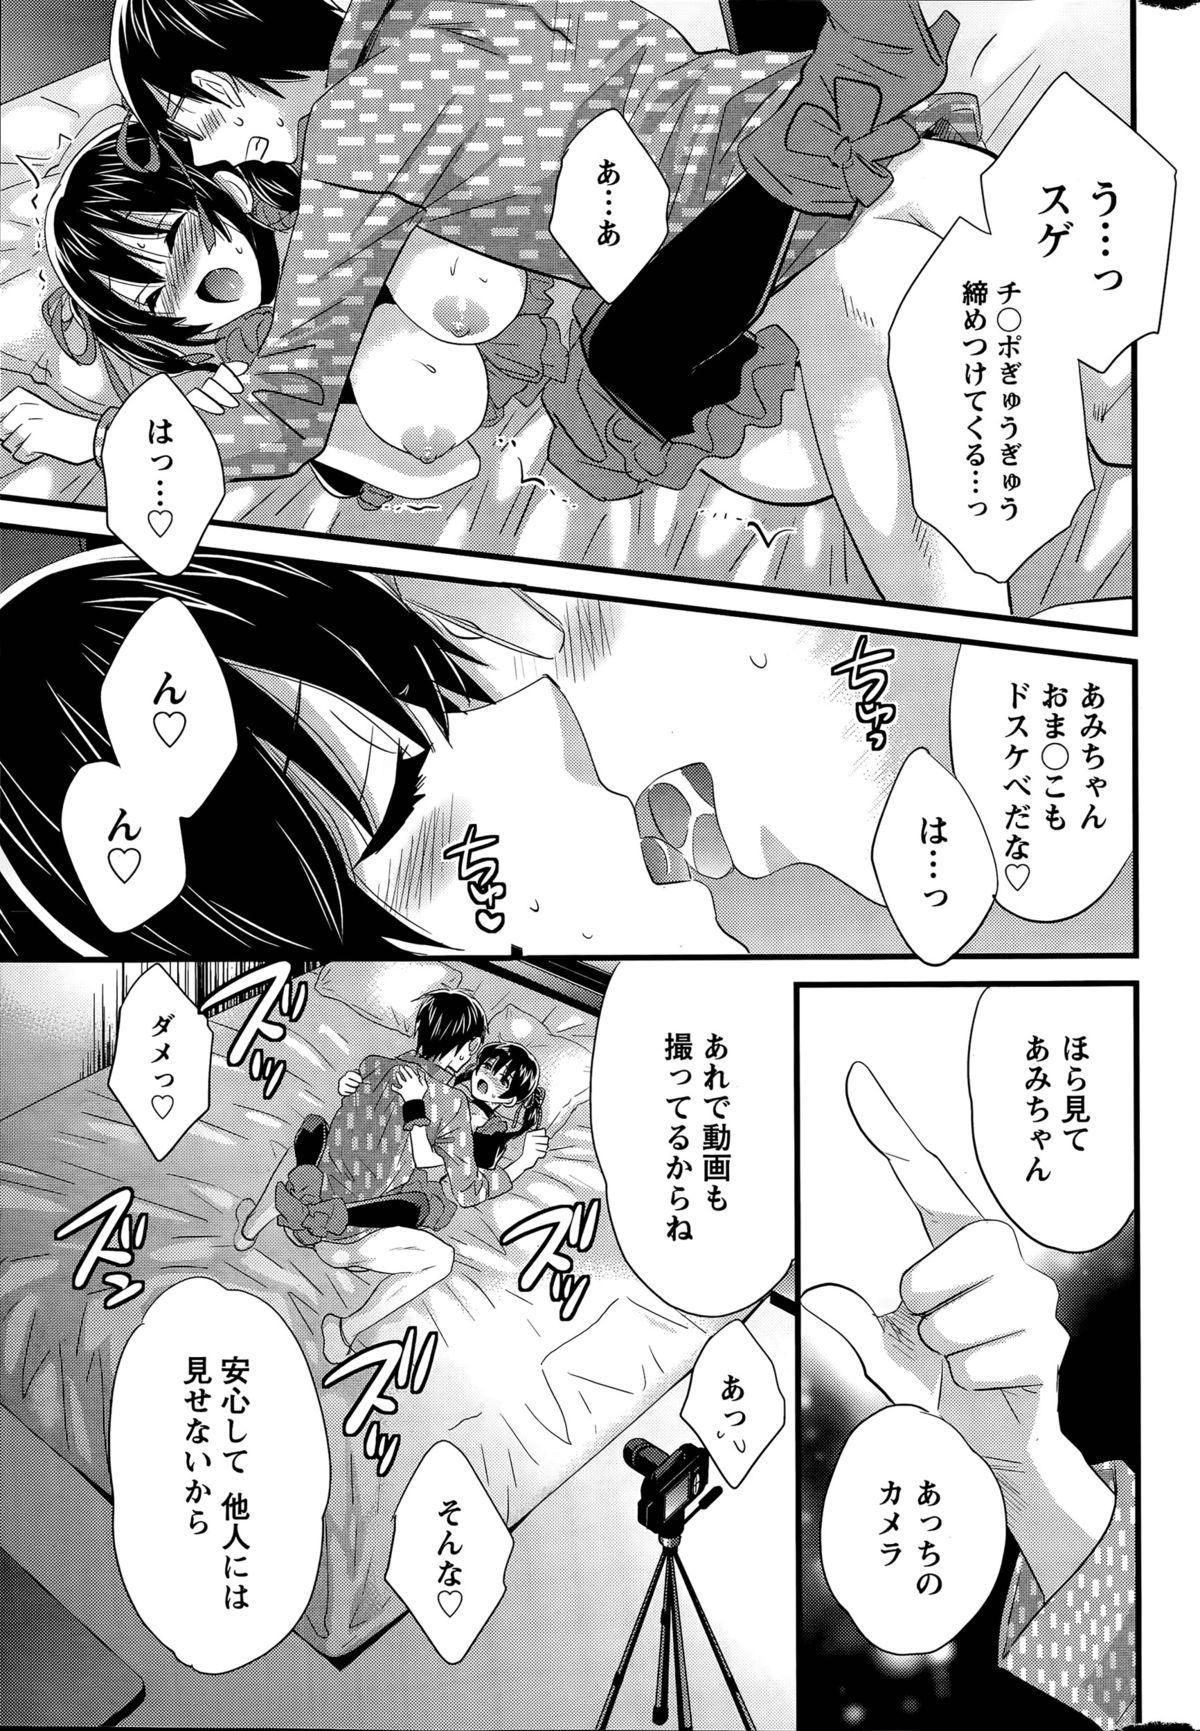 [Pon Takahanada] Otani-san no Cosplay Jijou Ch. 1-5 14